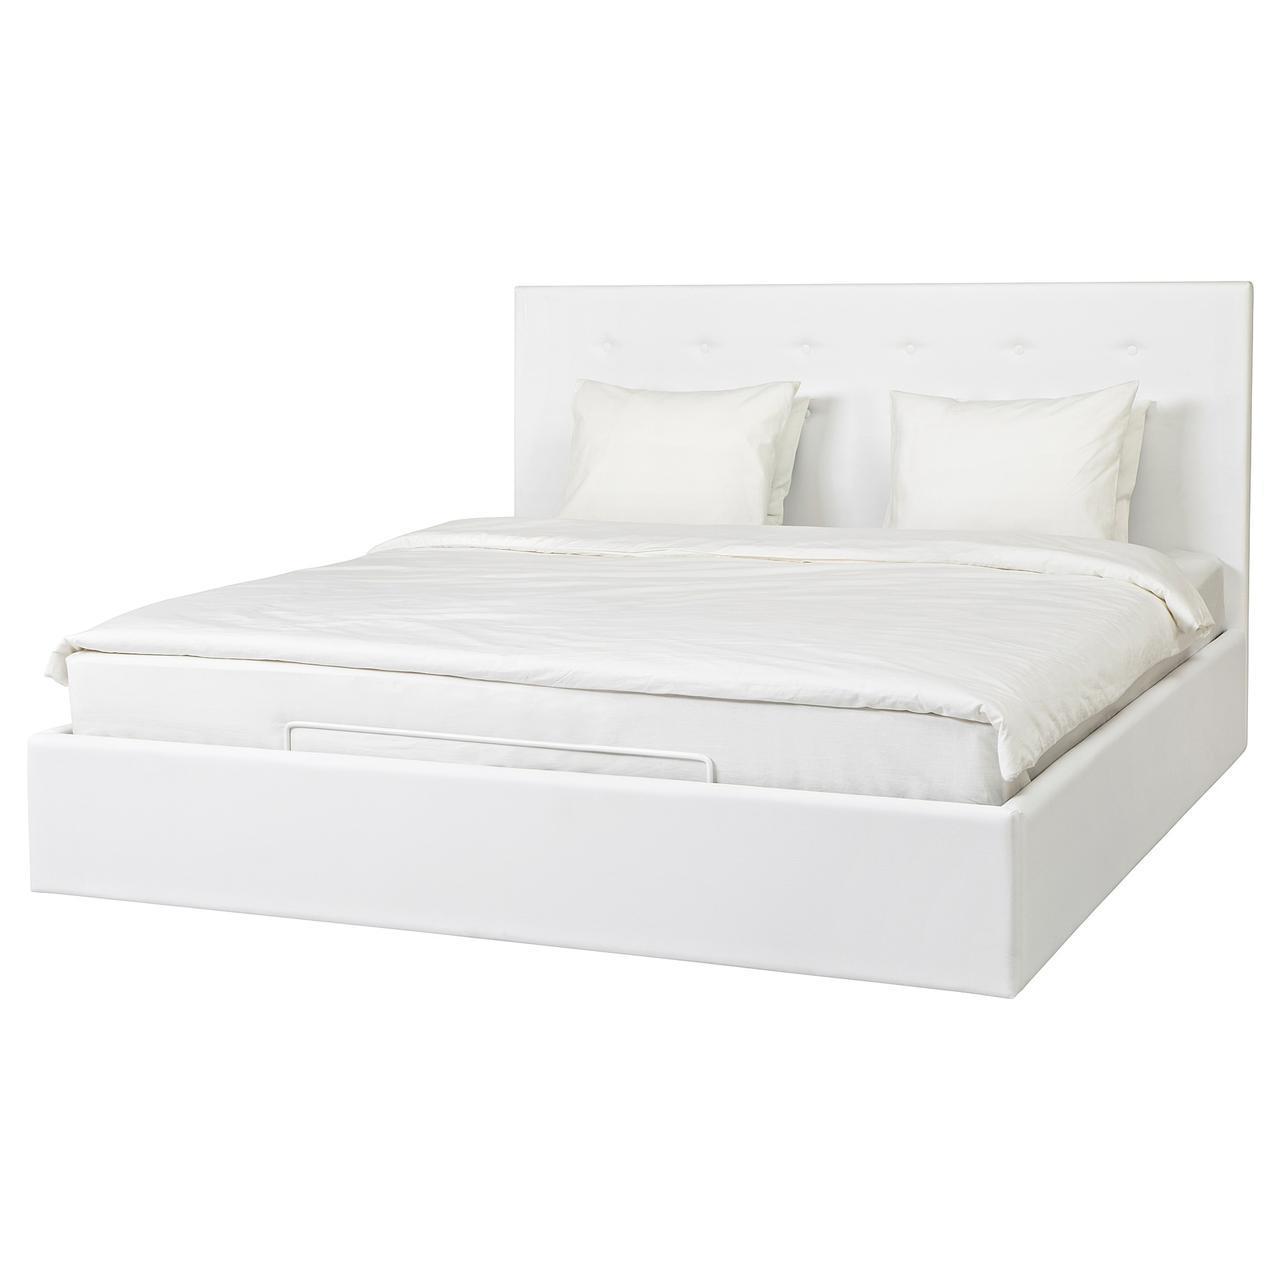 Ikea Gvarv 60409722 кровать с подъемным механизмом Idhult White